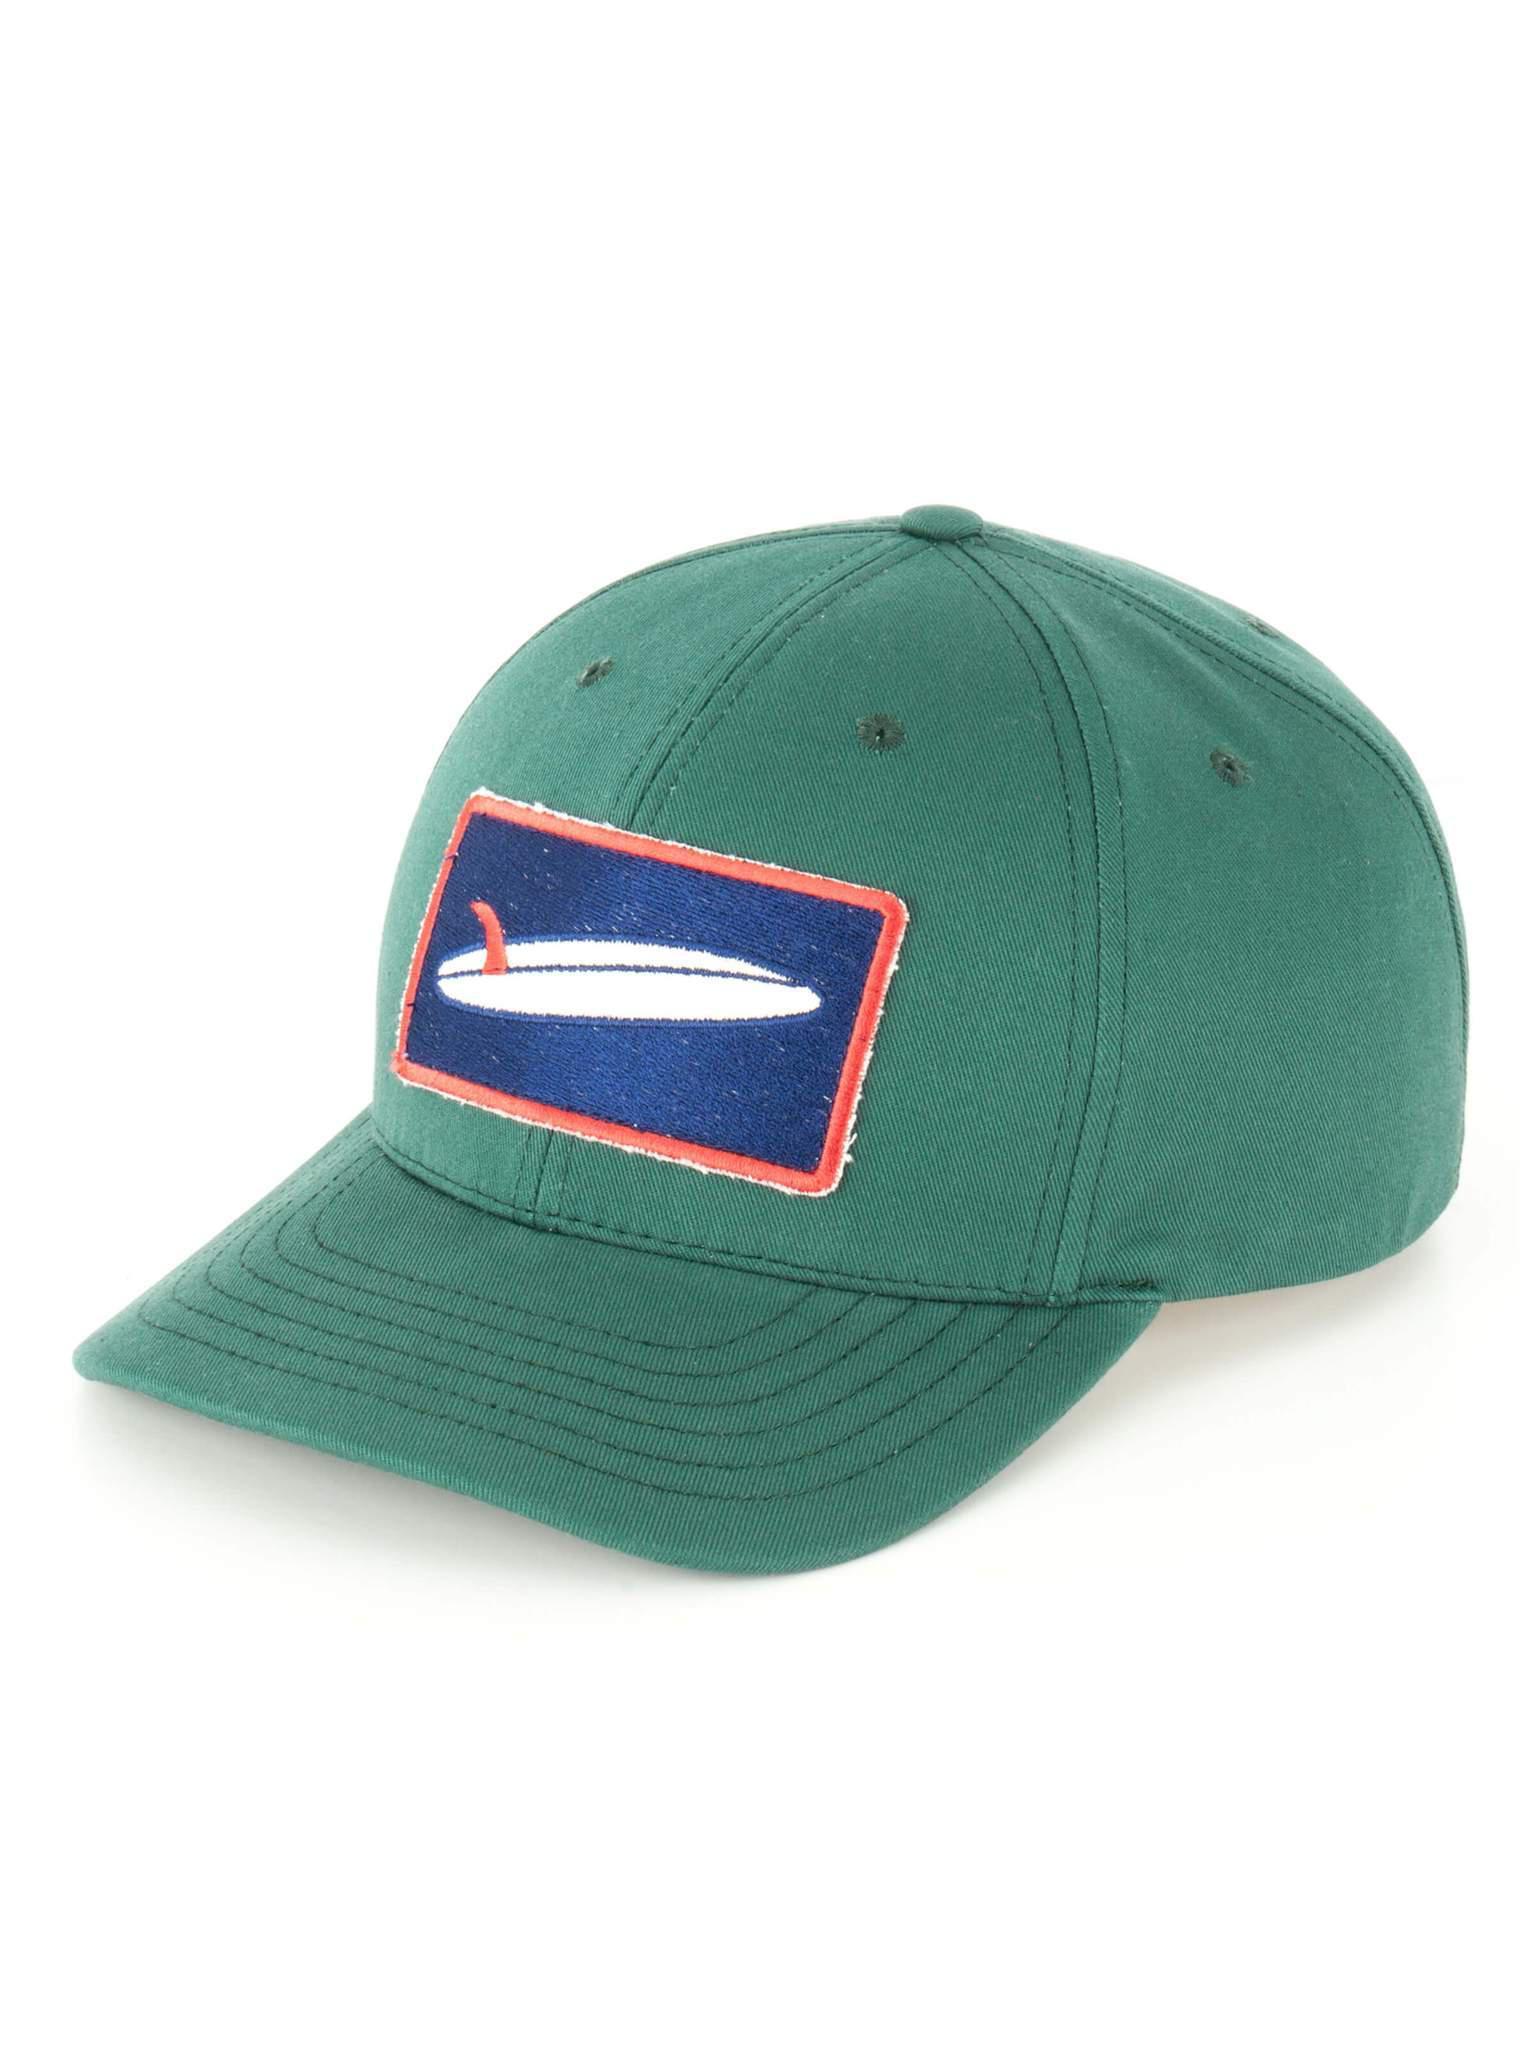 8e127497388 Lyst - Mollusk Single Track Mind Hat in Green for Men